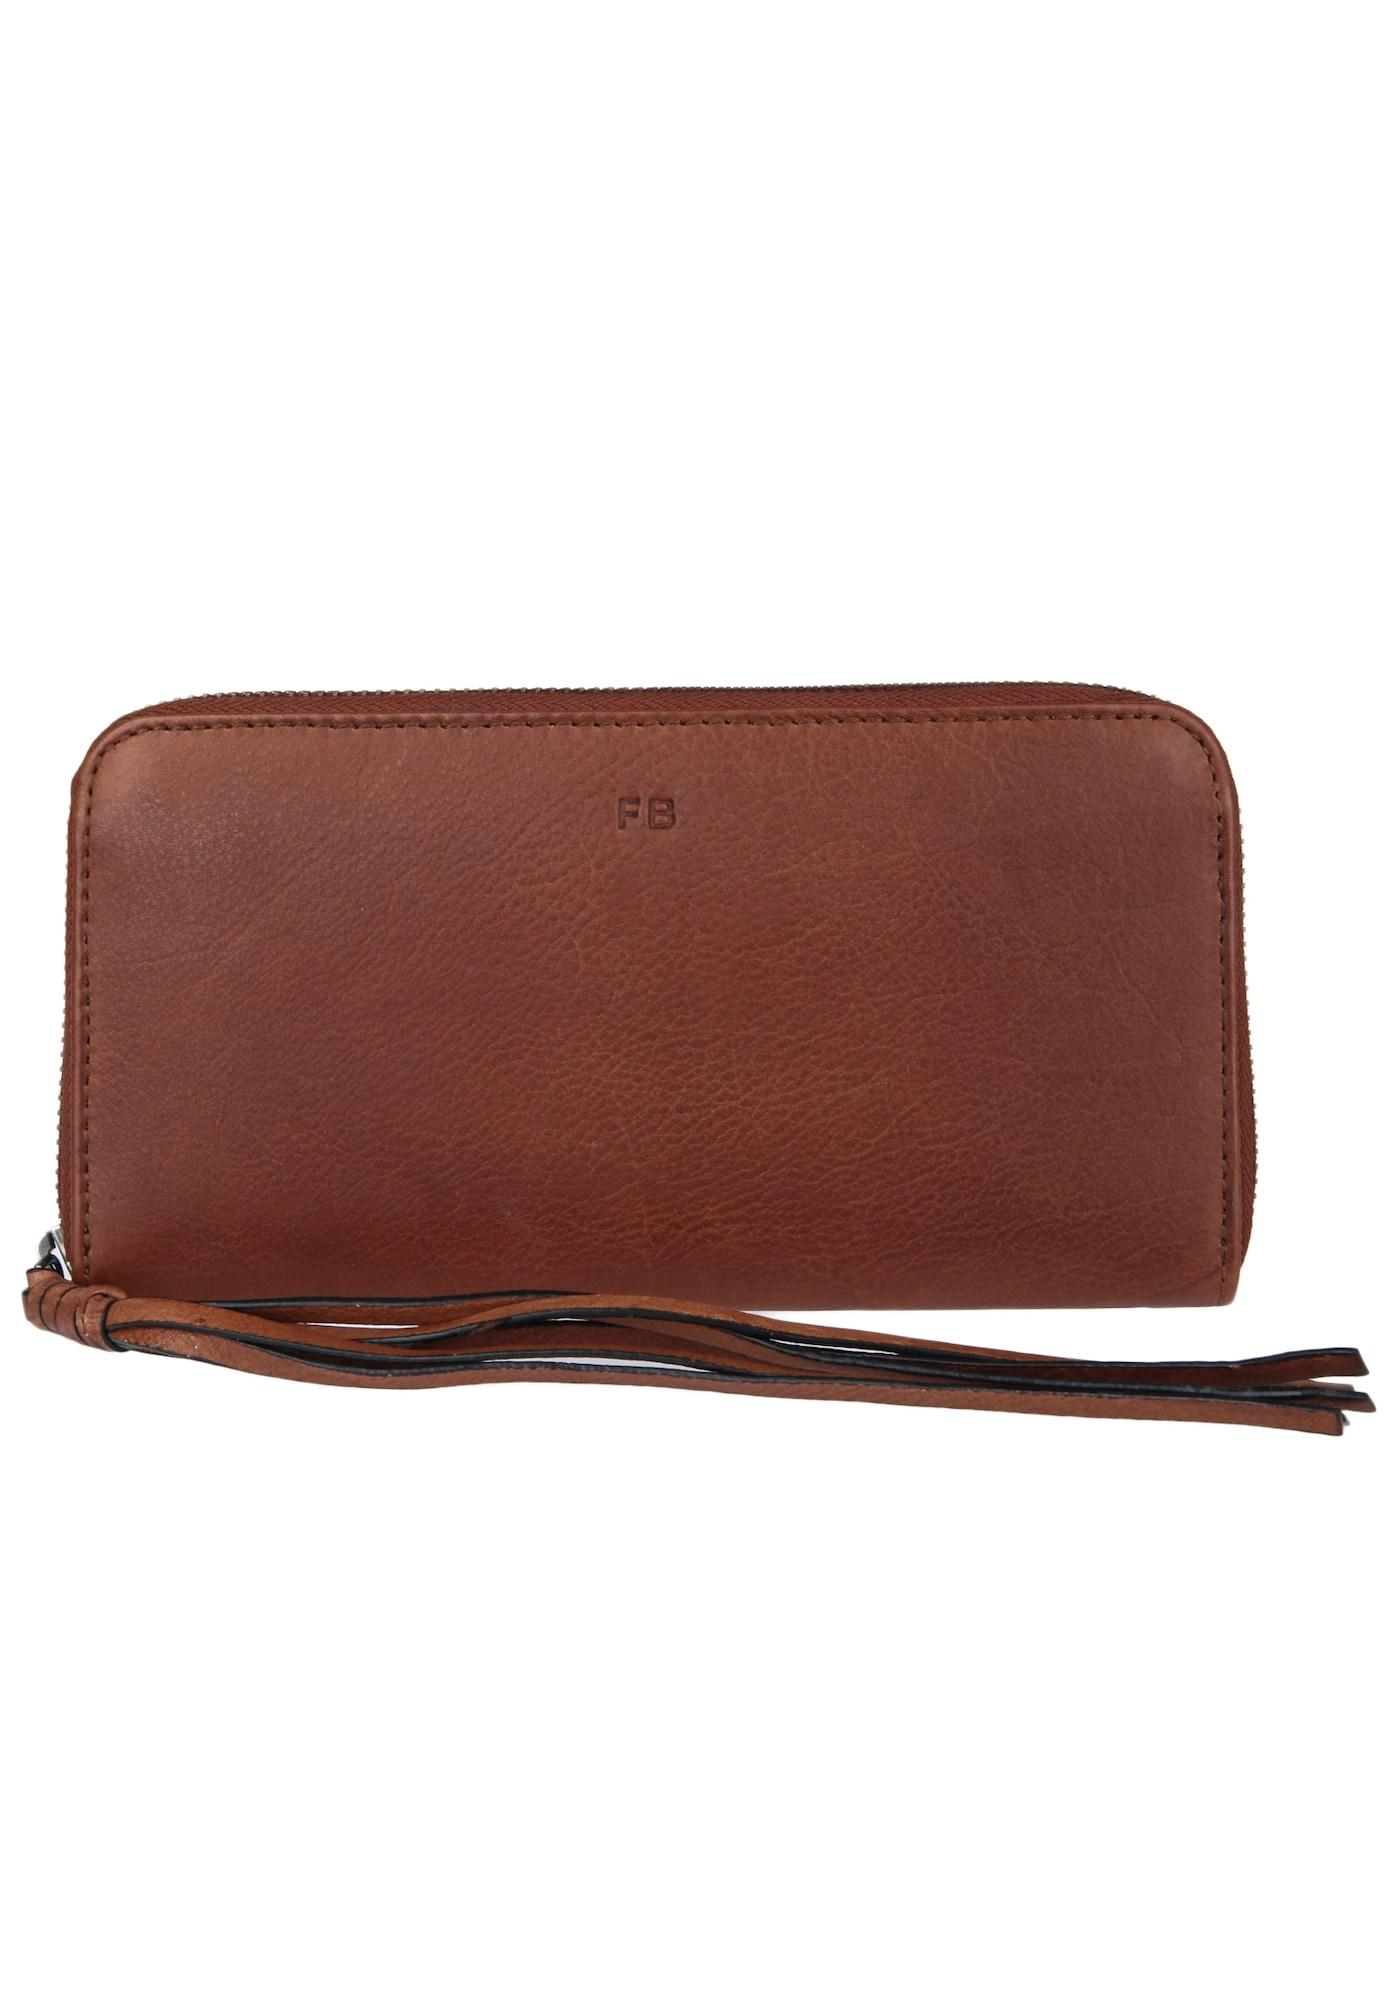 Portemonnaie 'ZOOM ZIP WALLET' | Accessoires > Portemonnaies > Sonstige Portemonnaies | FREDsBRUDER